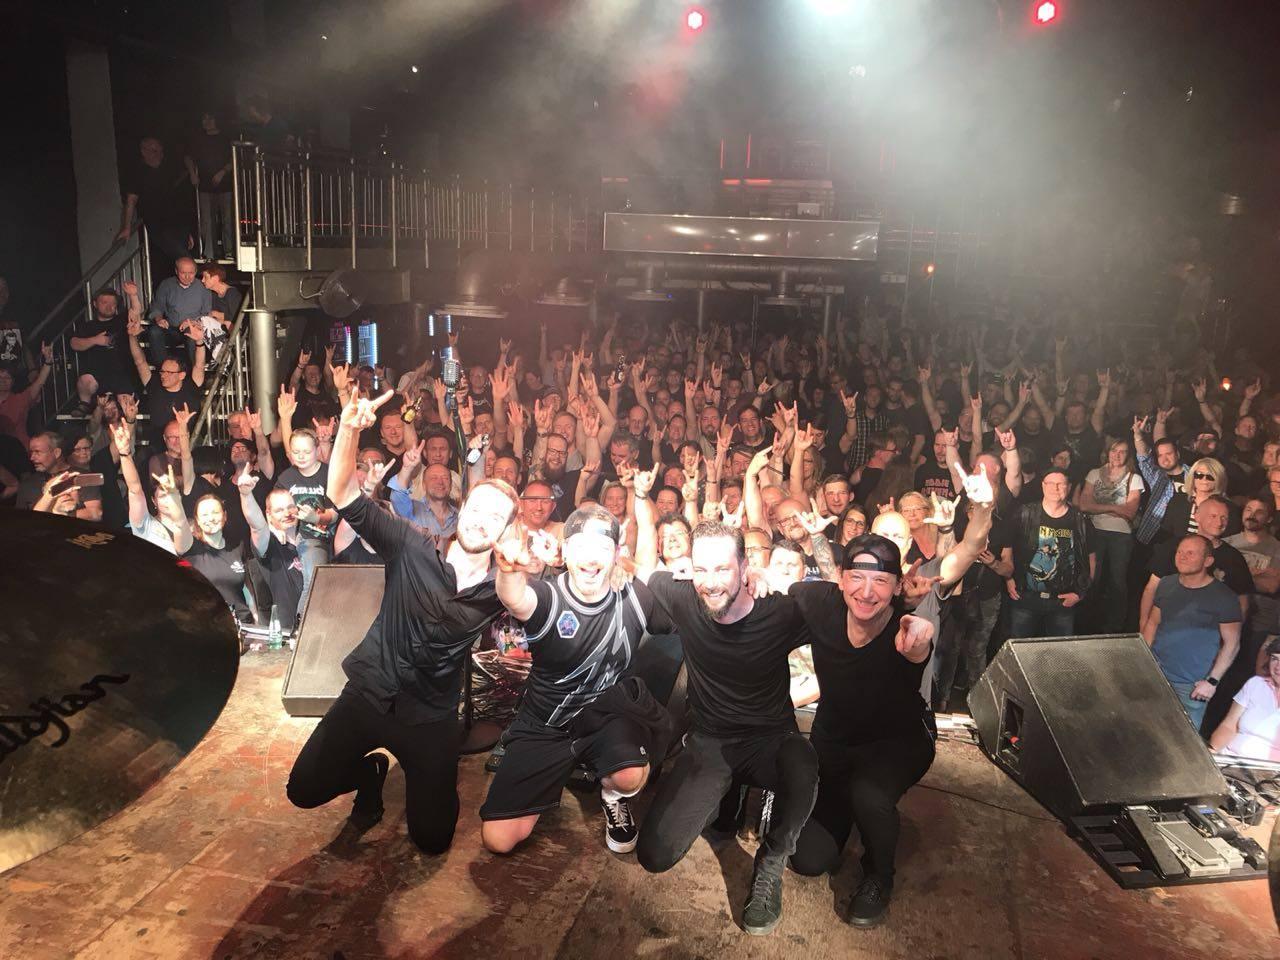 metallica-tribute-band-mytallica-live-bochum-zeche-2018-buehne-thank-you-fans